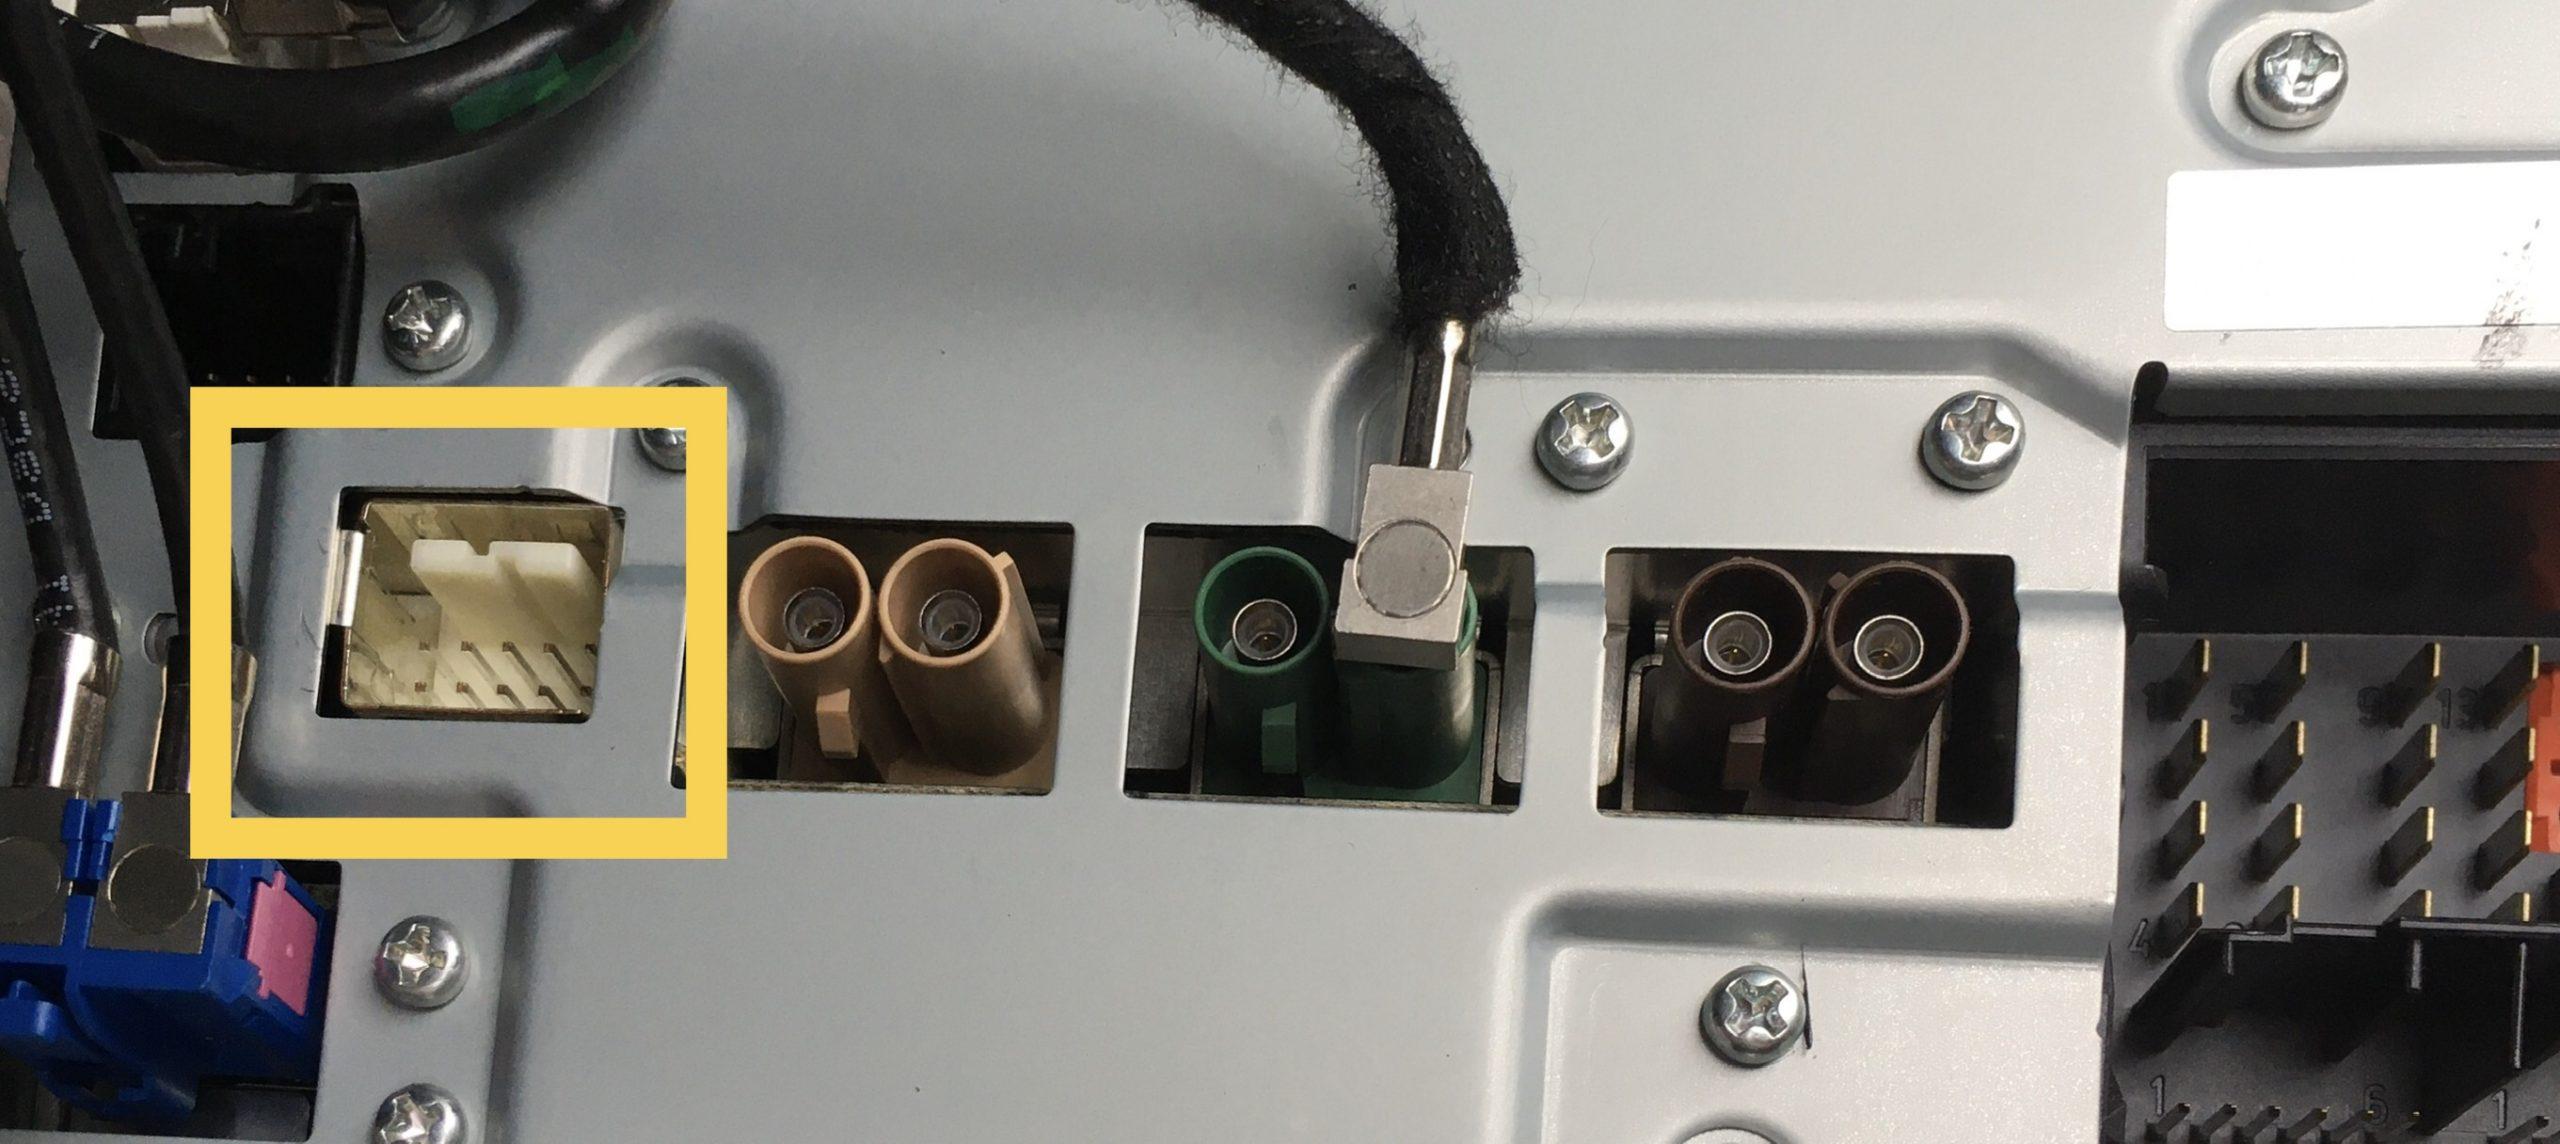 NTG4.0 display connector